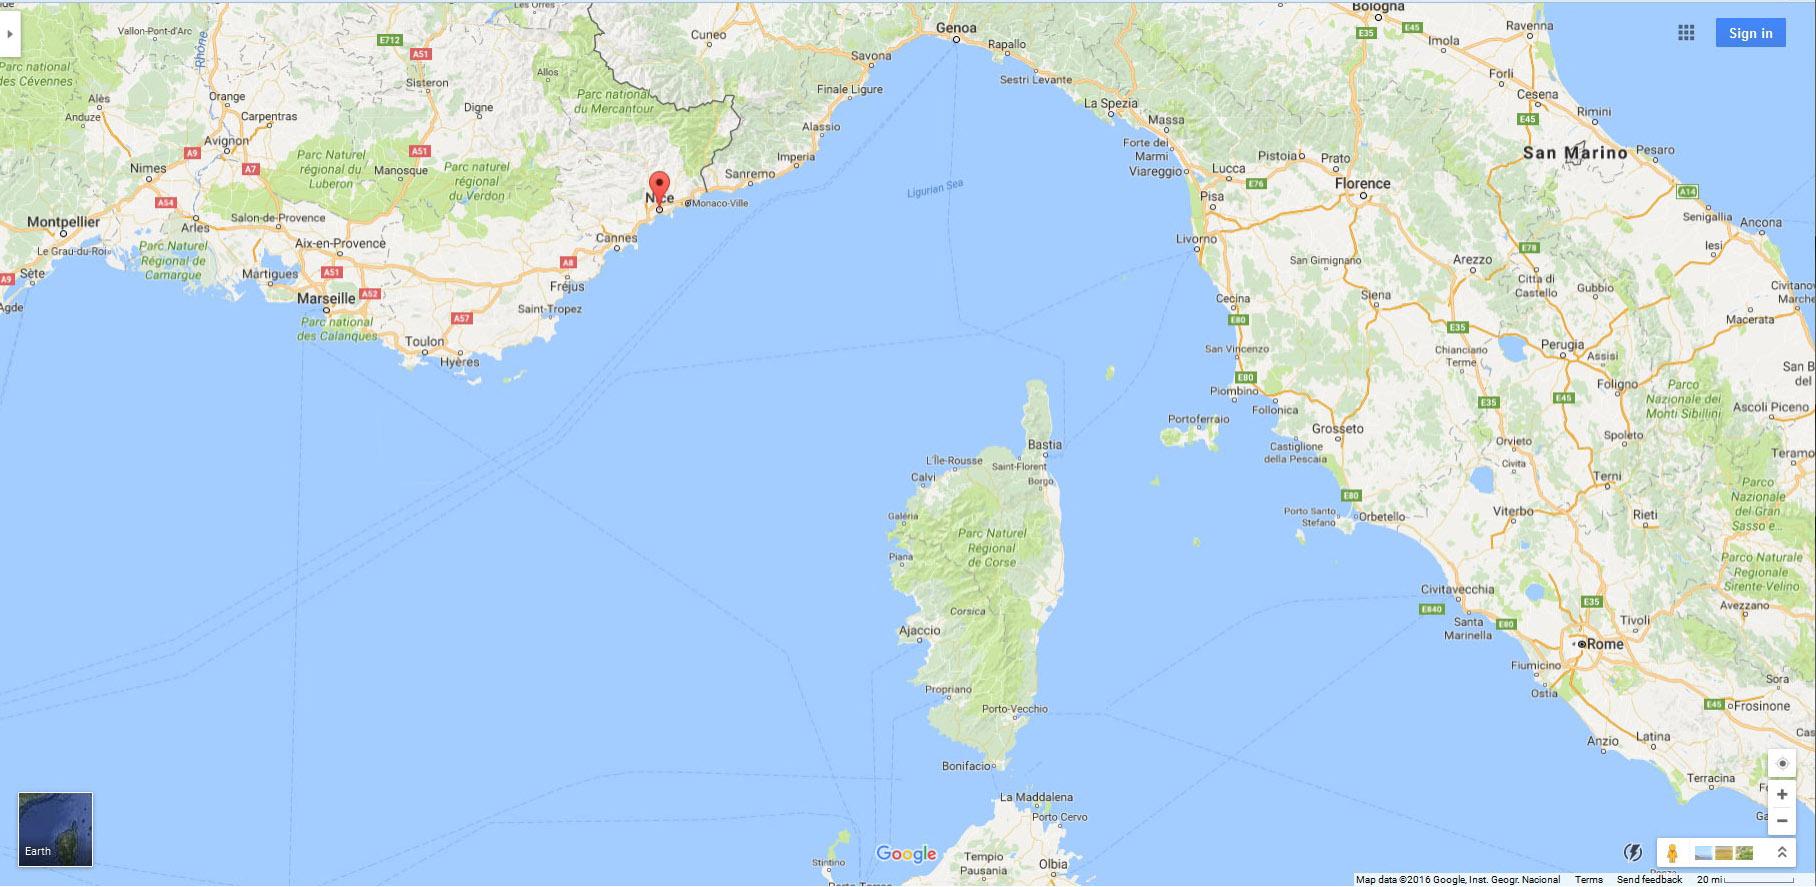 stefano magnanni udine italy map - photo#31